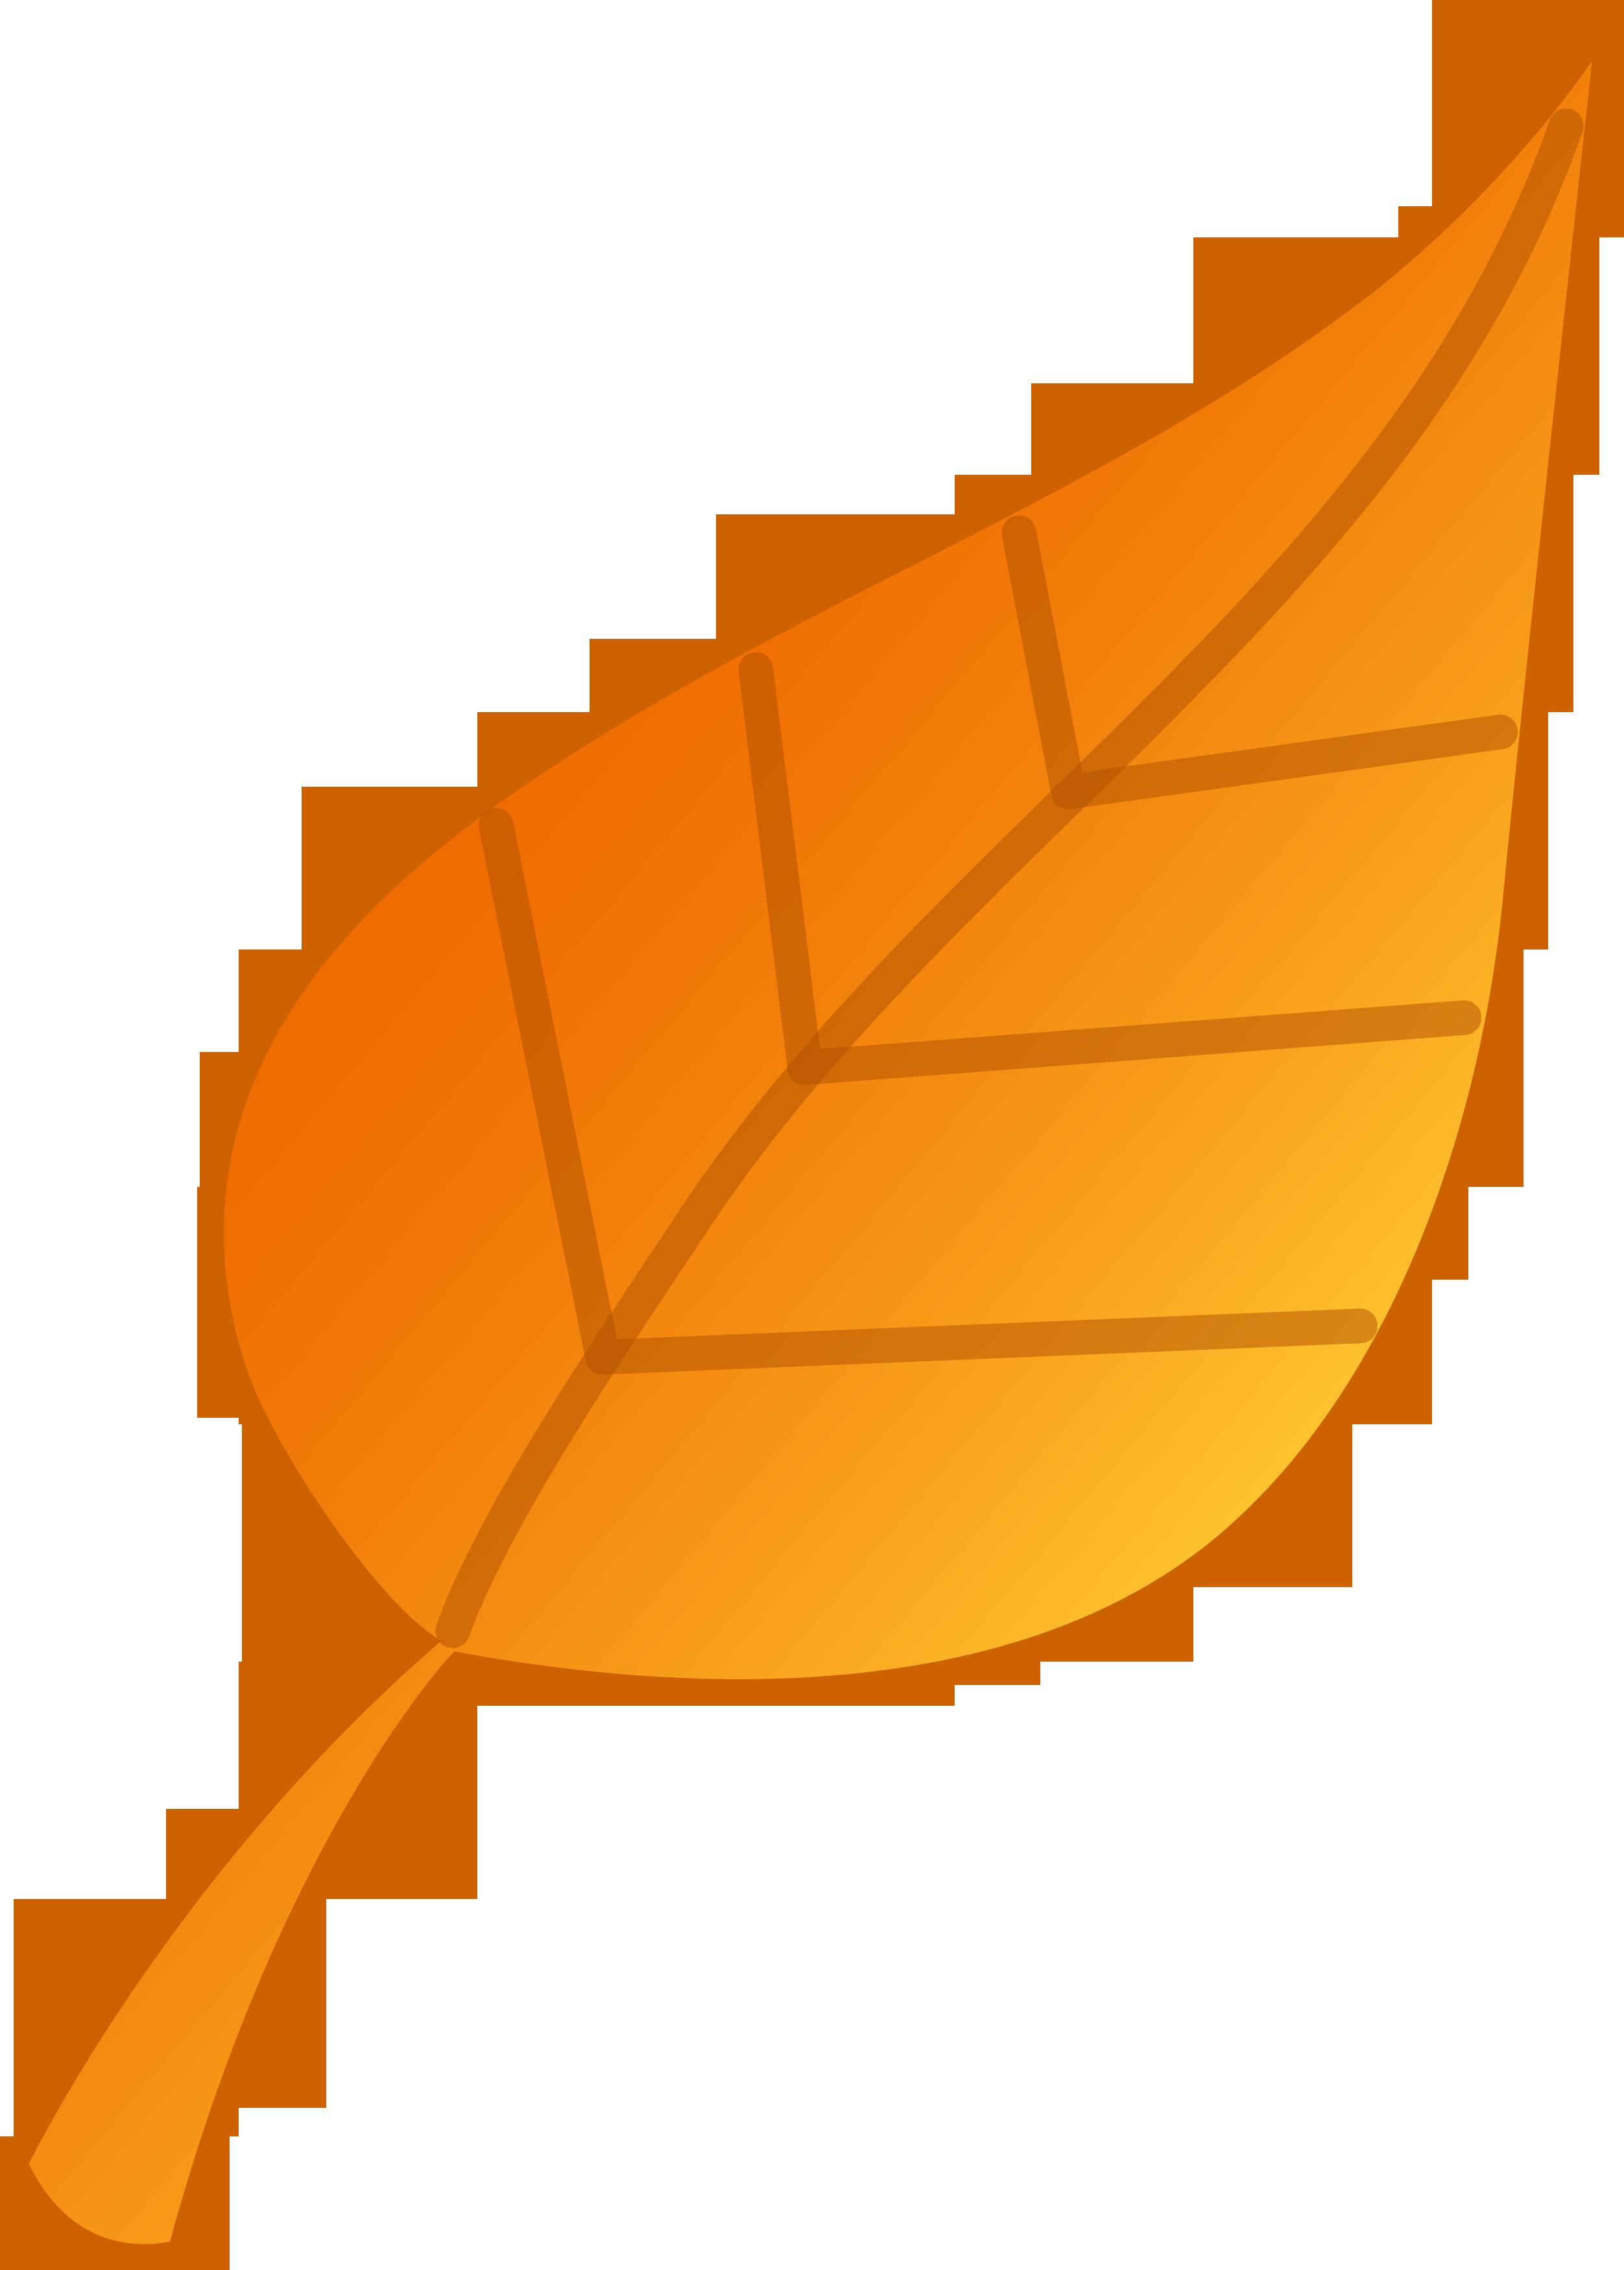 2504x3500 Image Result For Simple Leaf Clip Art Leo Variedad De Comidas